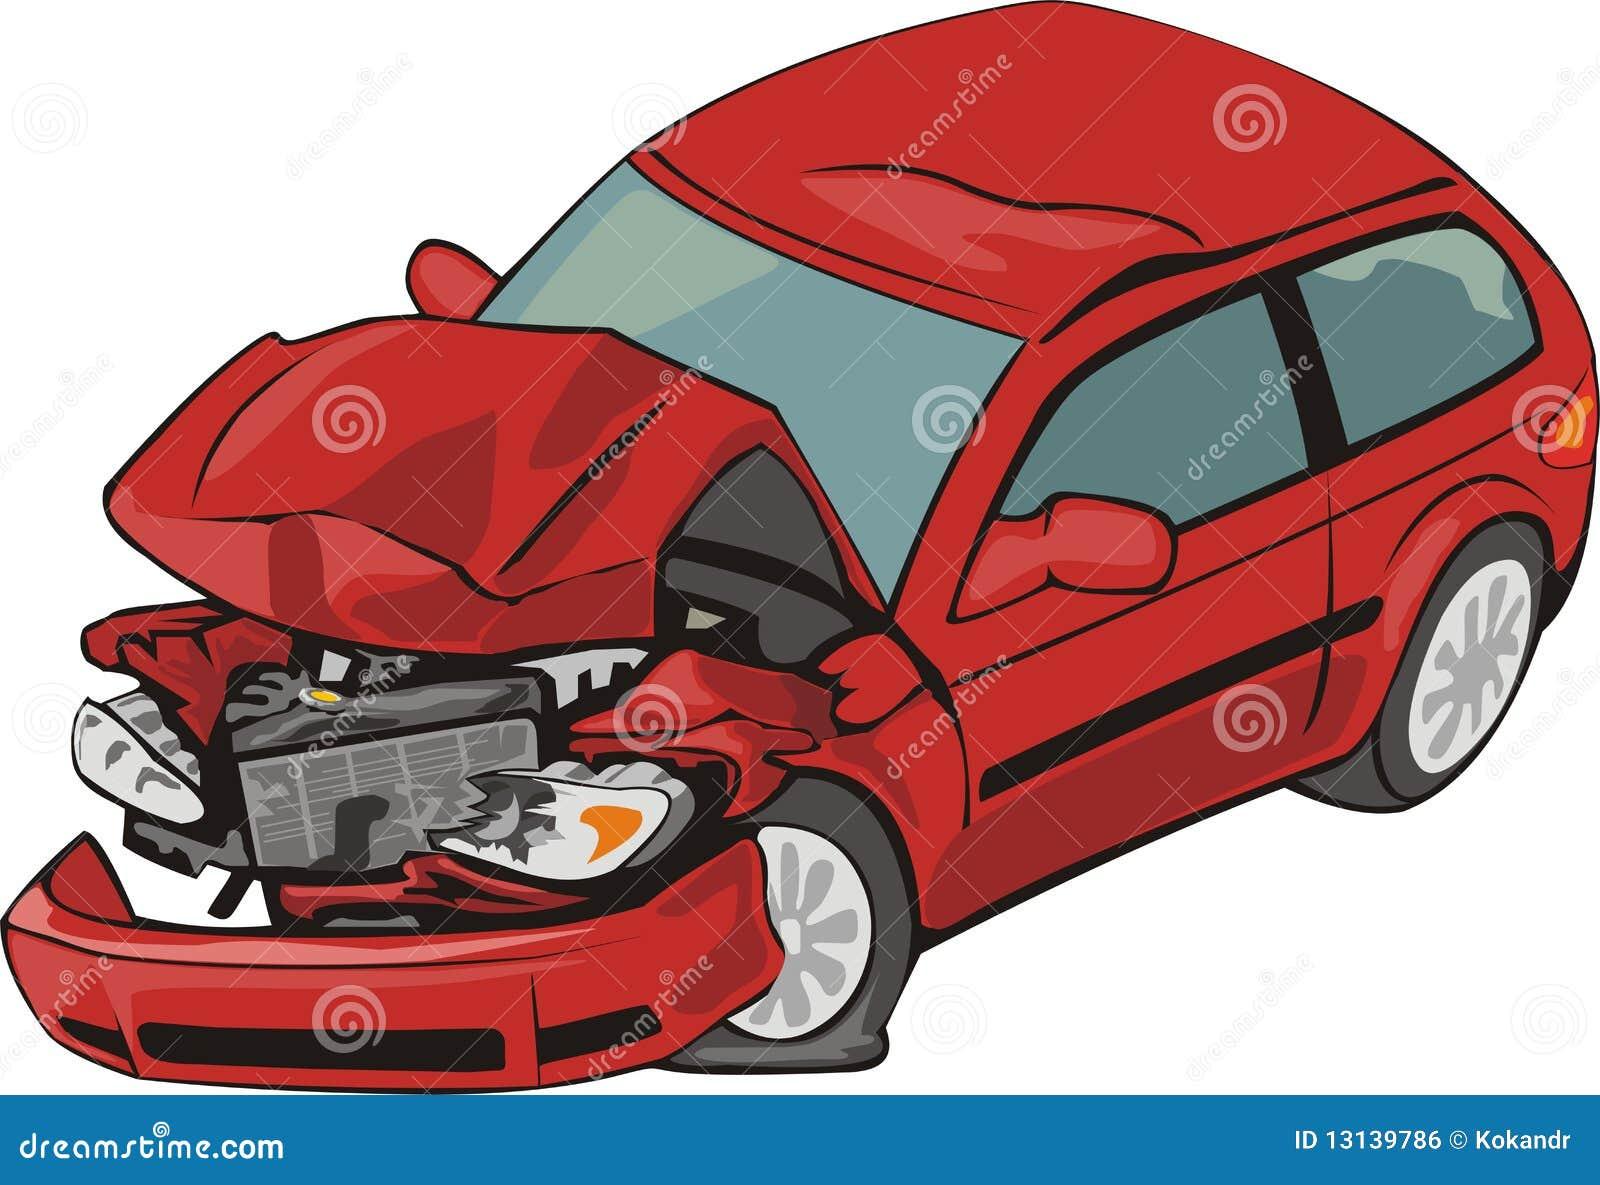 free clipart auto accident - photo #33